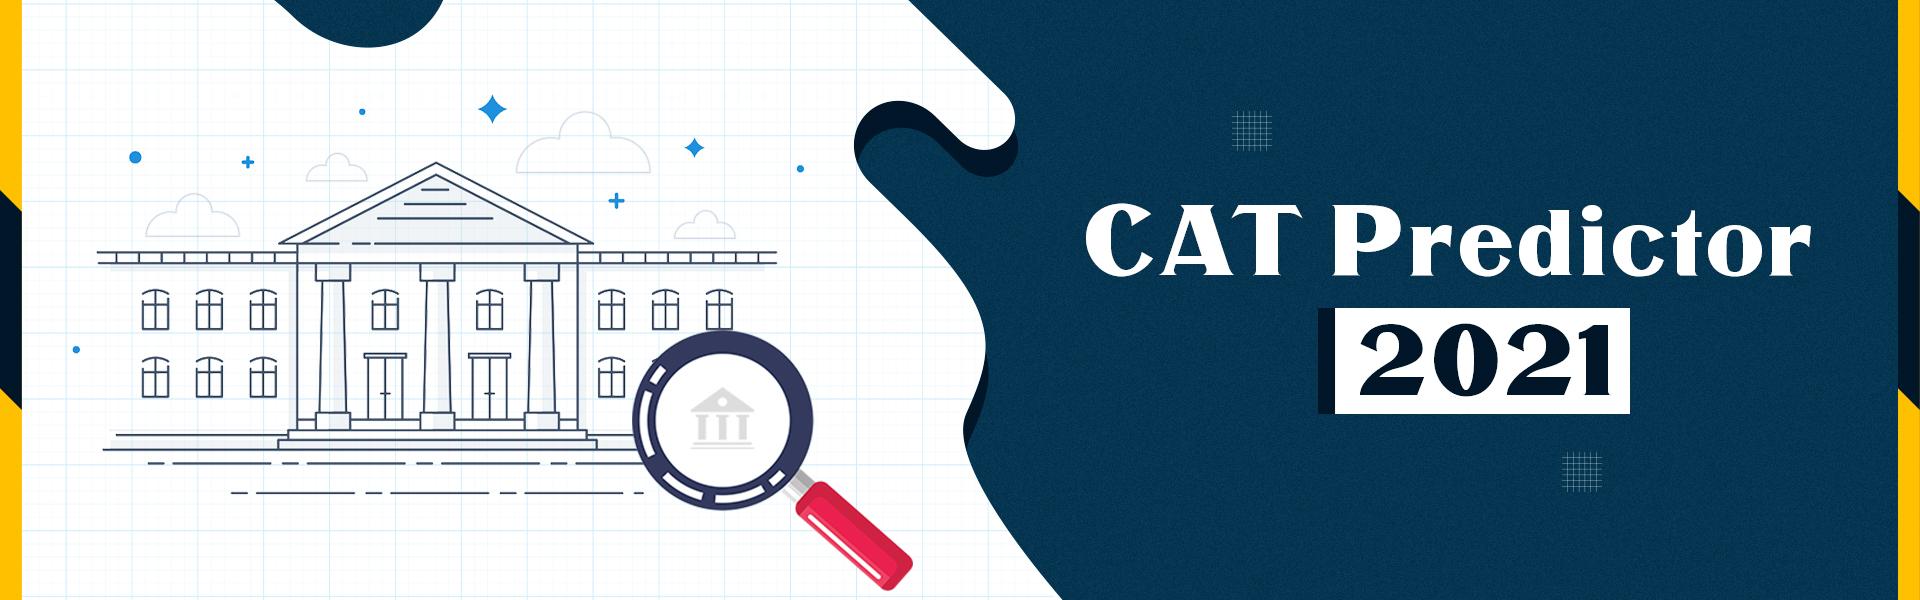 CAT Predictor 2021